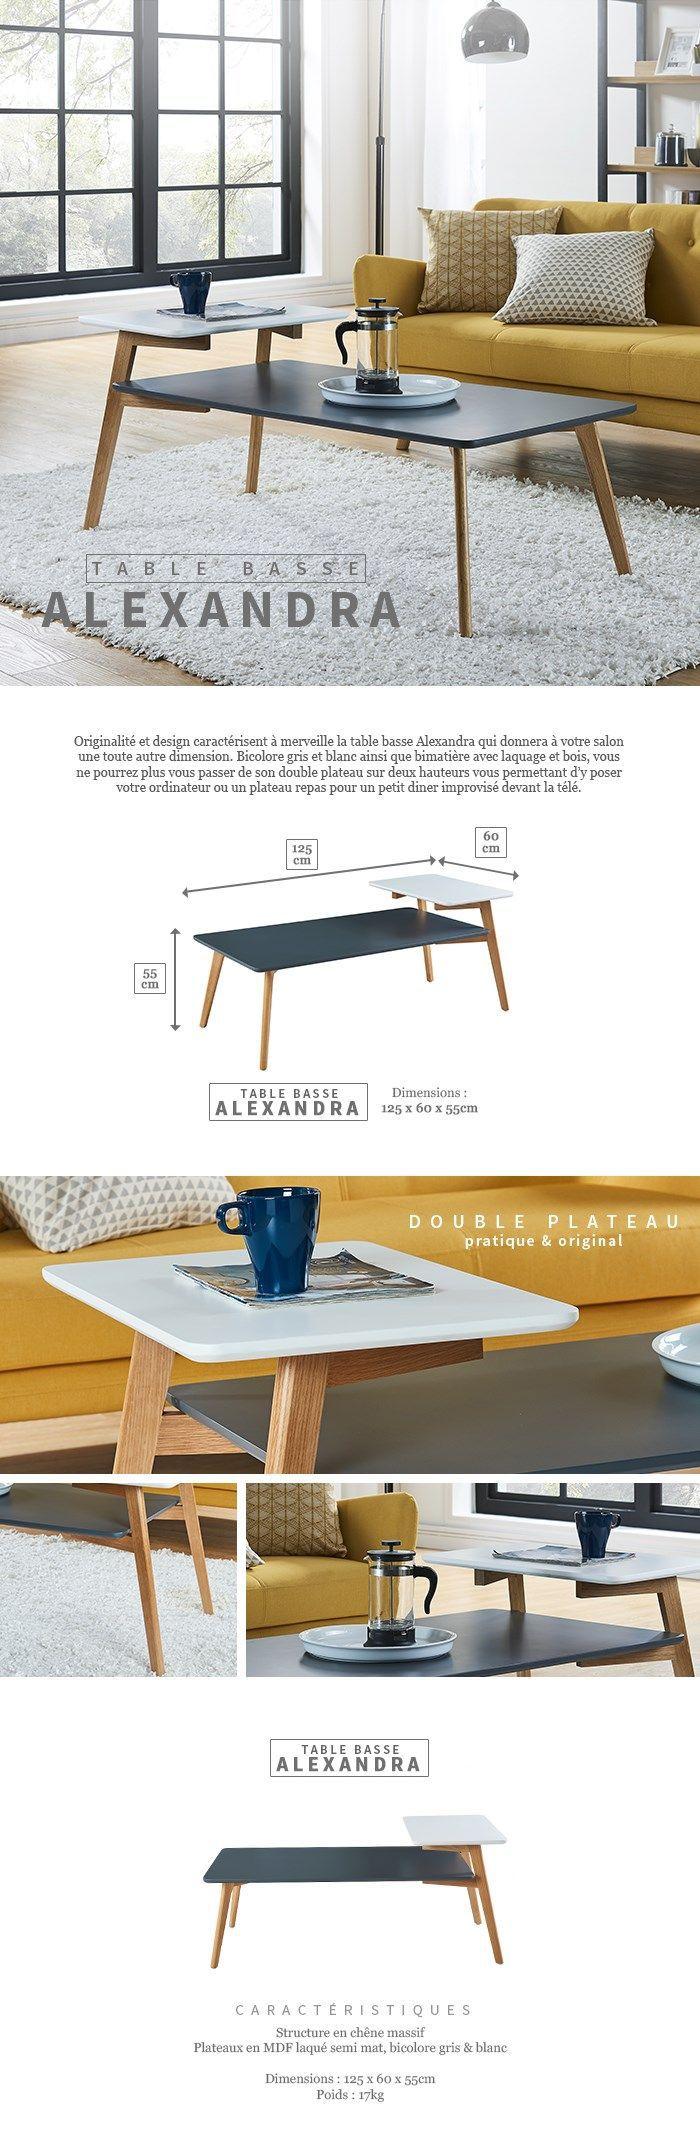 alexandra table basse vintage en bois ch234ne massif et mdf